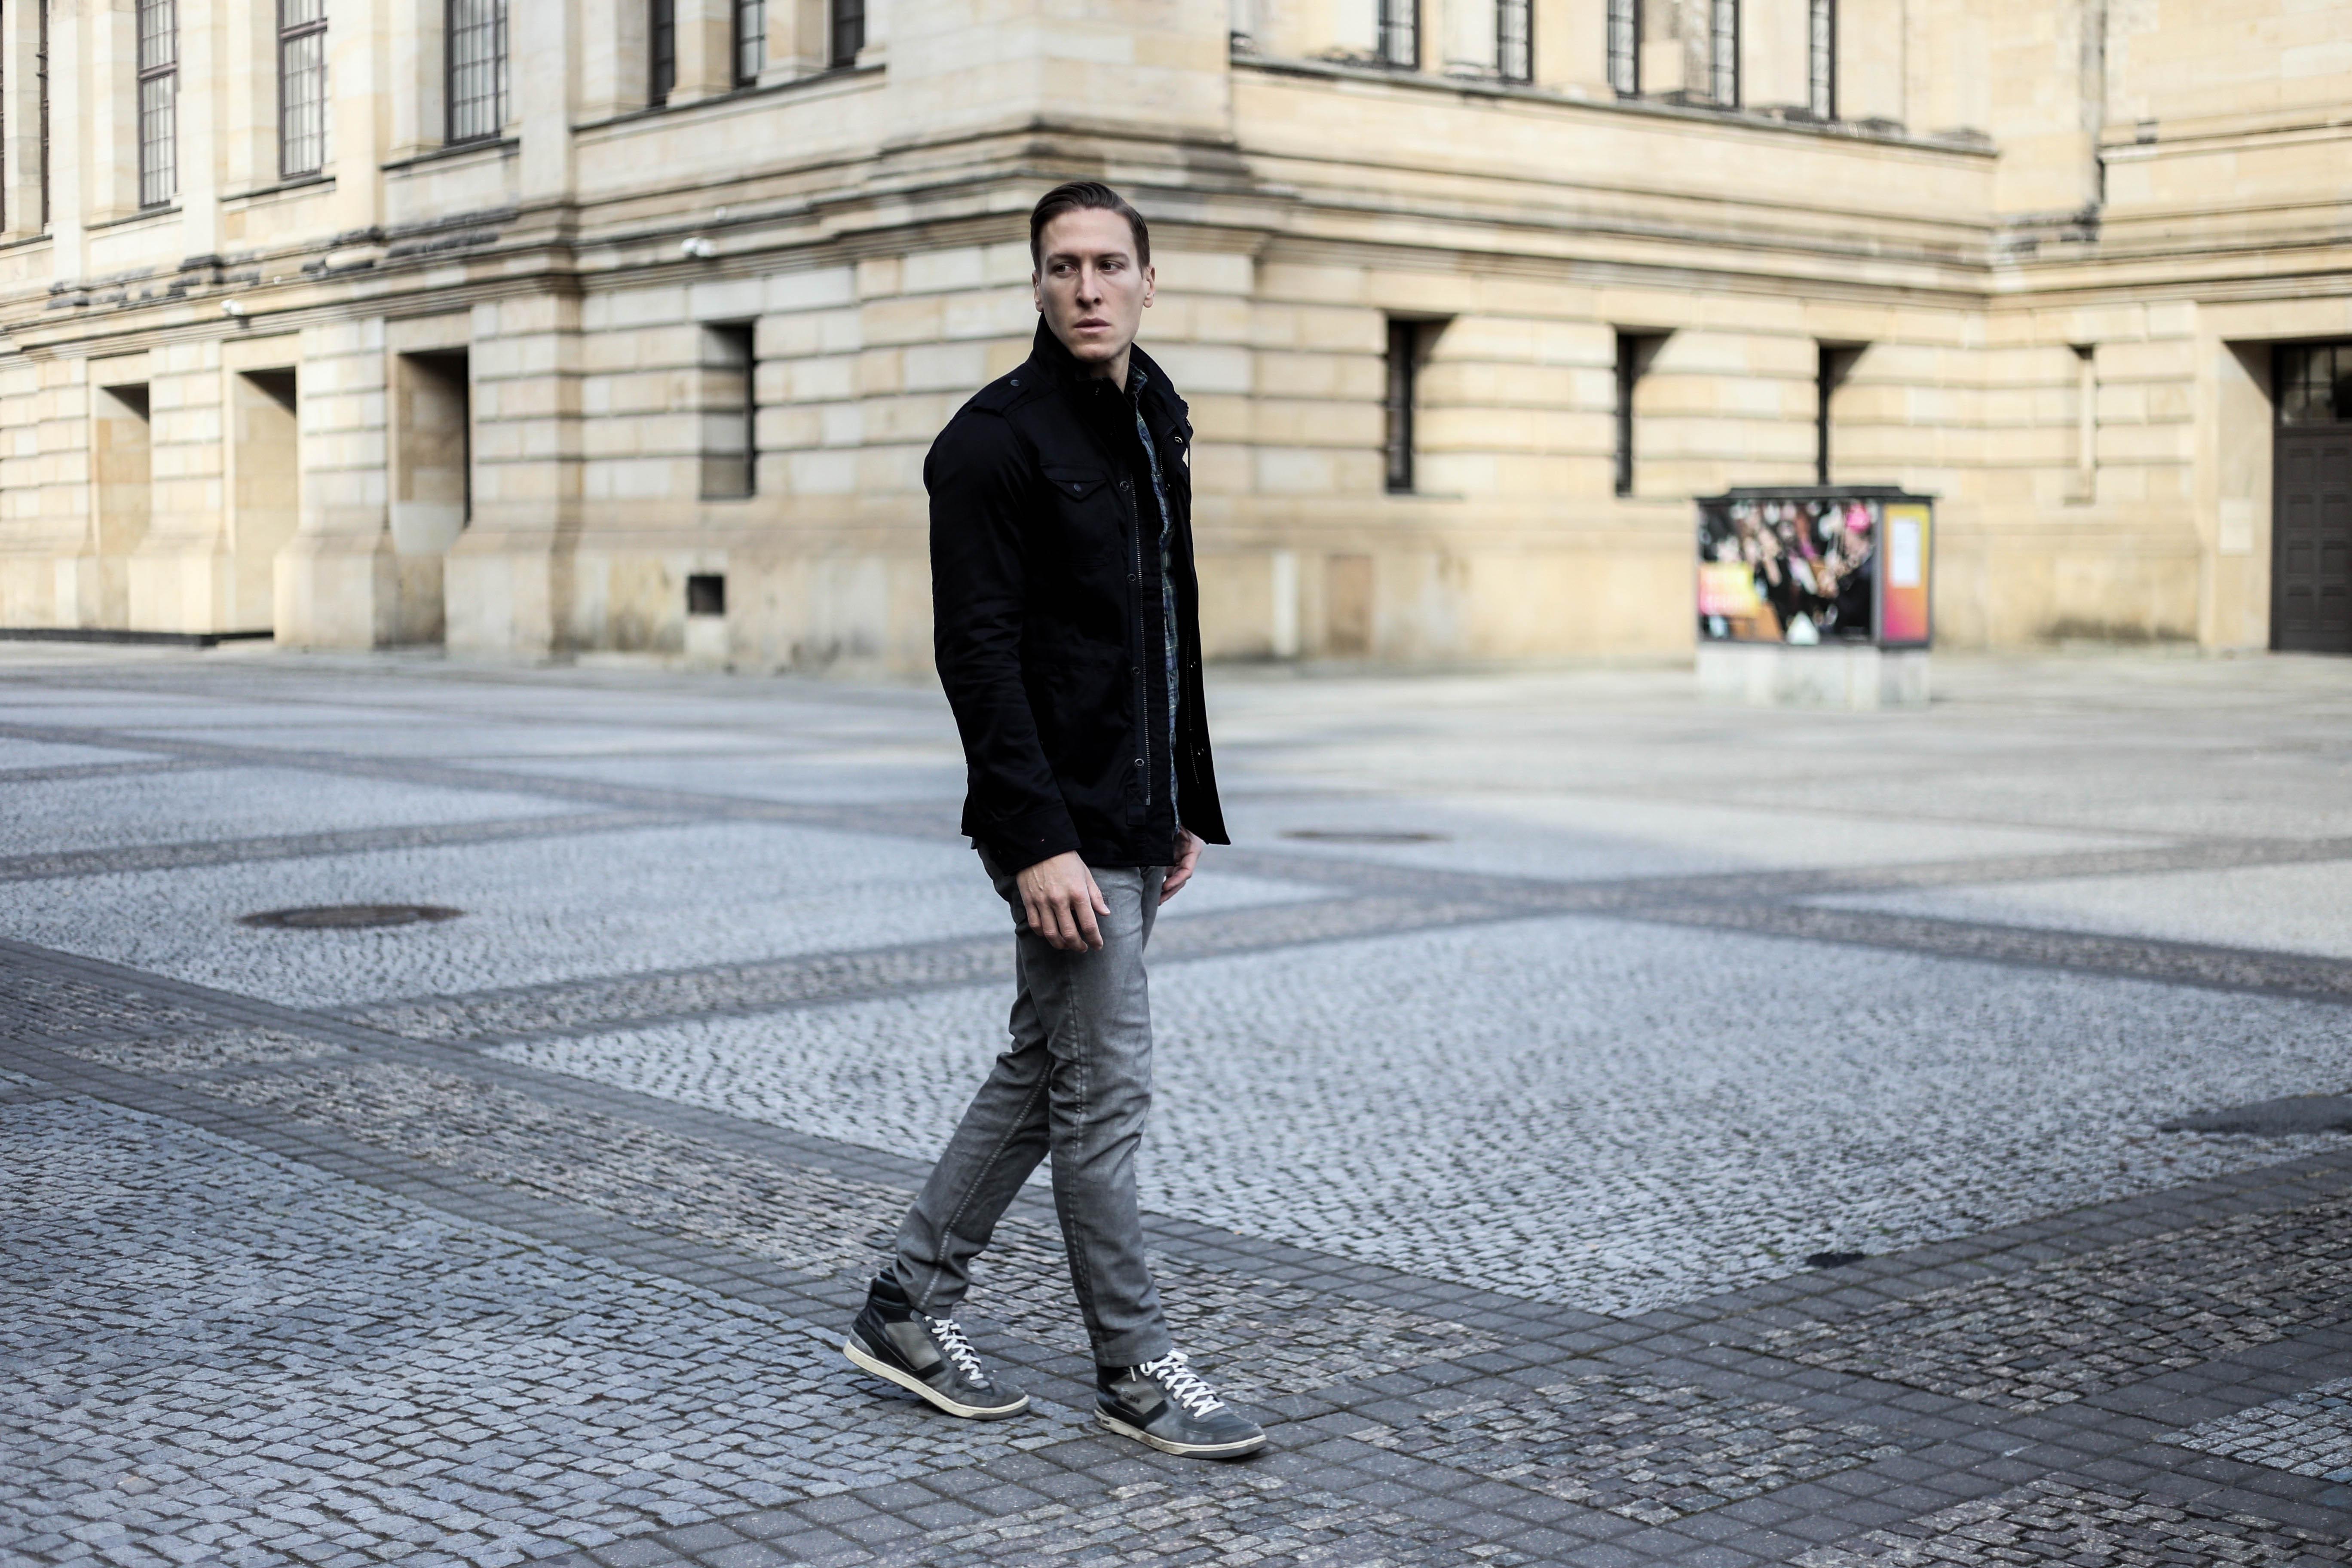 kariertes-hemd-maennerblog-fashionblog-berlin-outfit-graue-jeans_4079